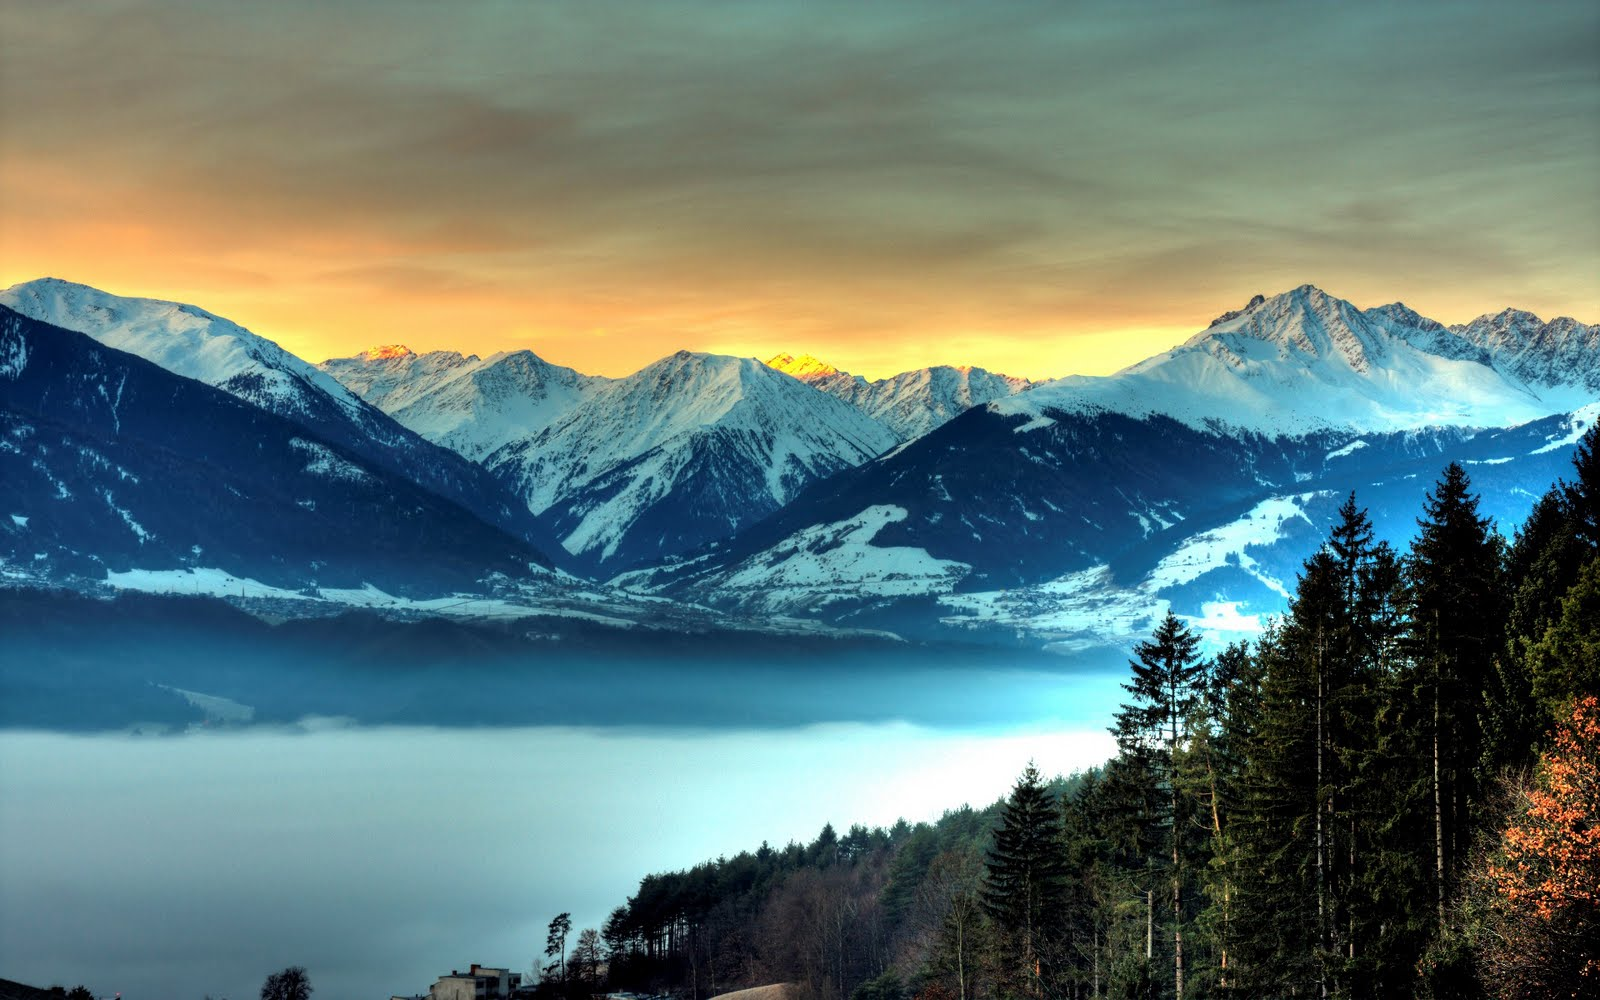 Hd Popular Wallpapers Download: Best Desktop HD Wallpaper: Landscap HD Wallpaper